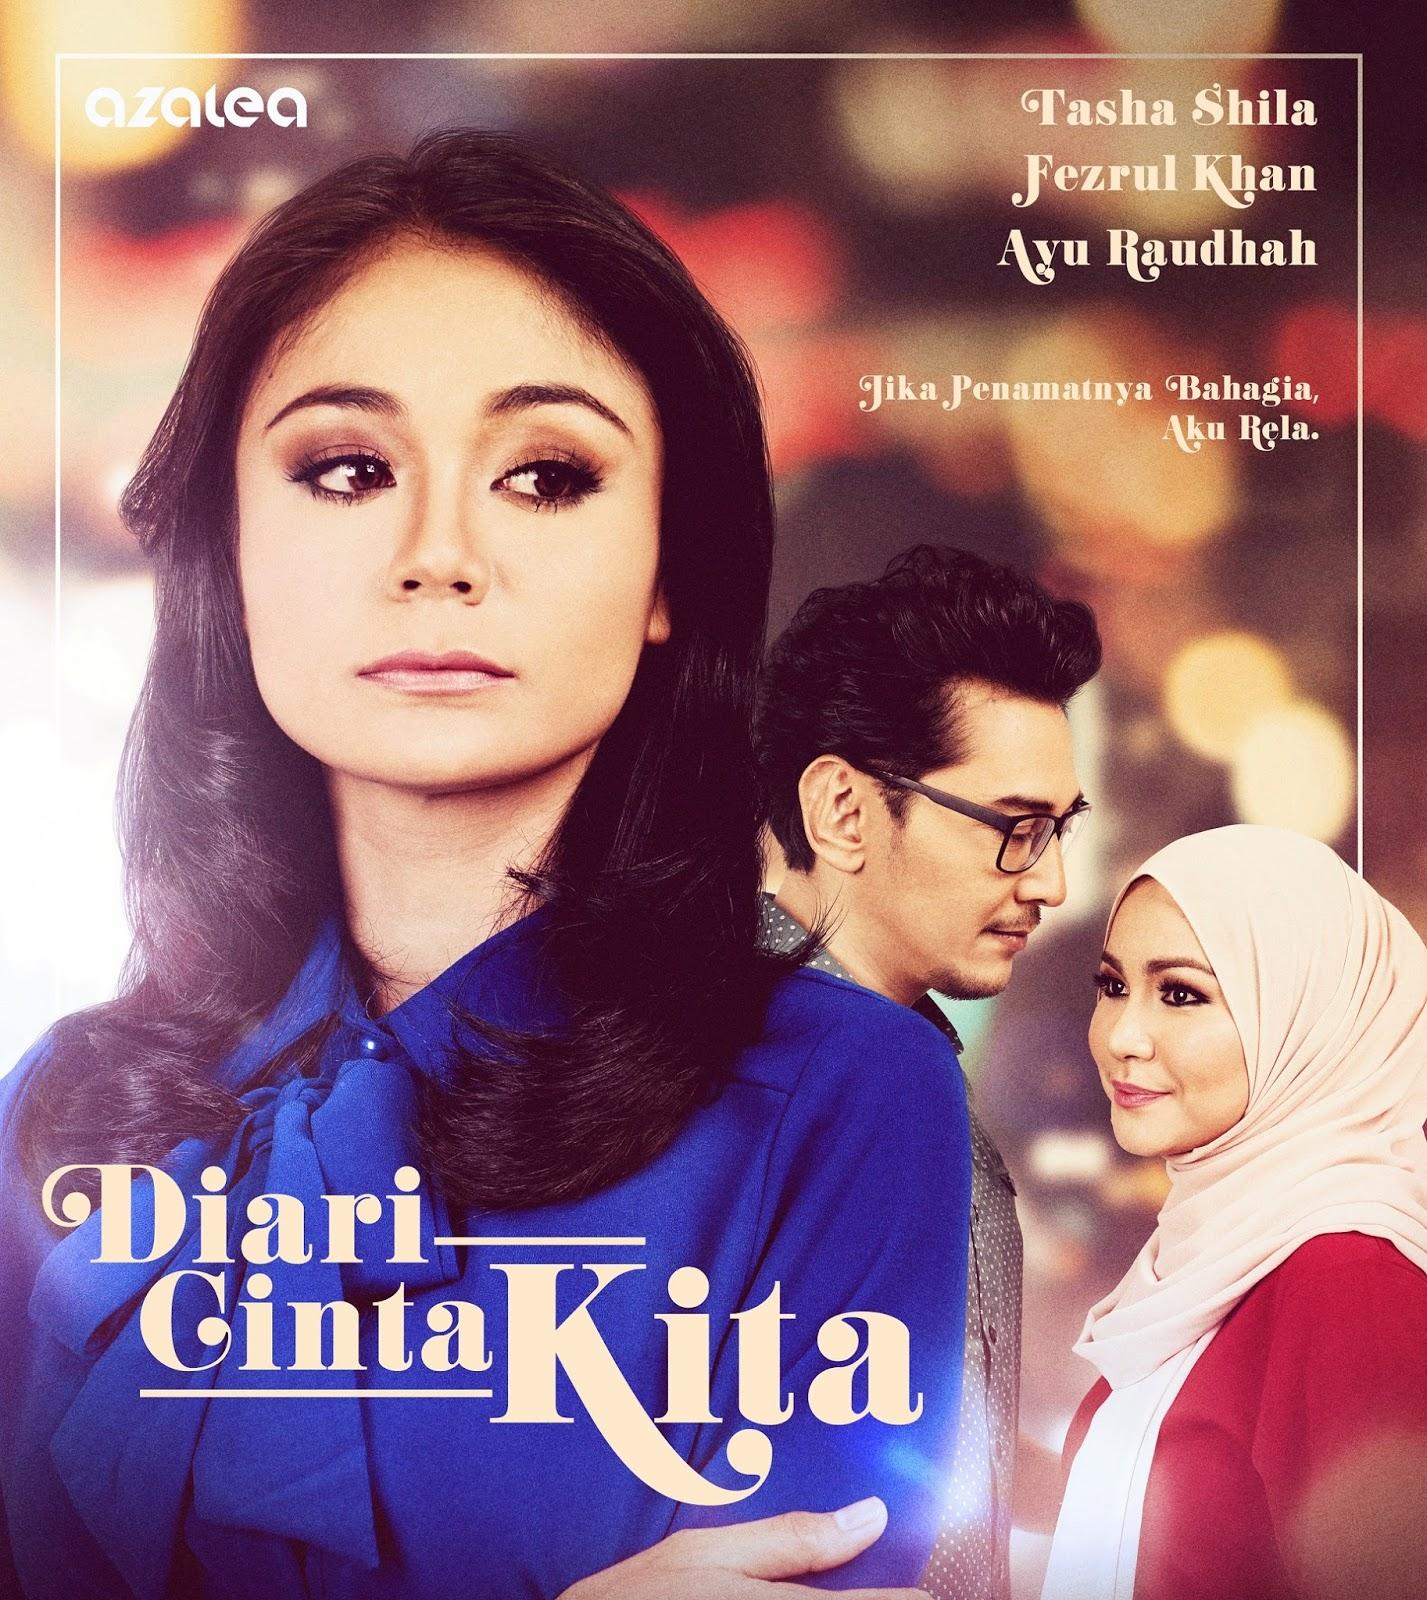 Drama Diari Cinta Kita (TV9)